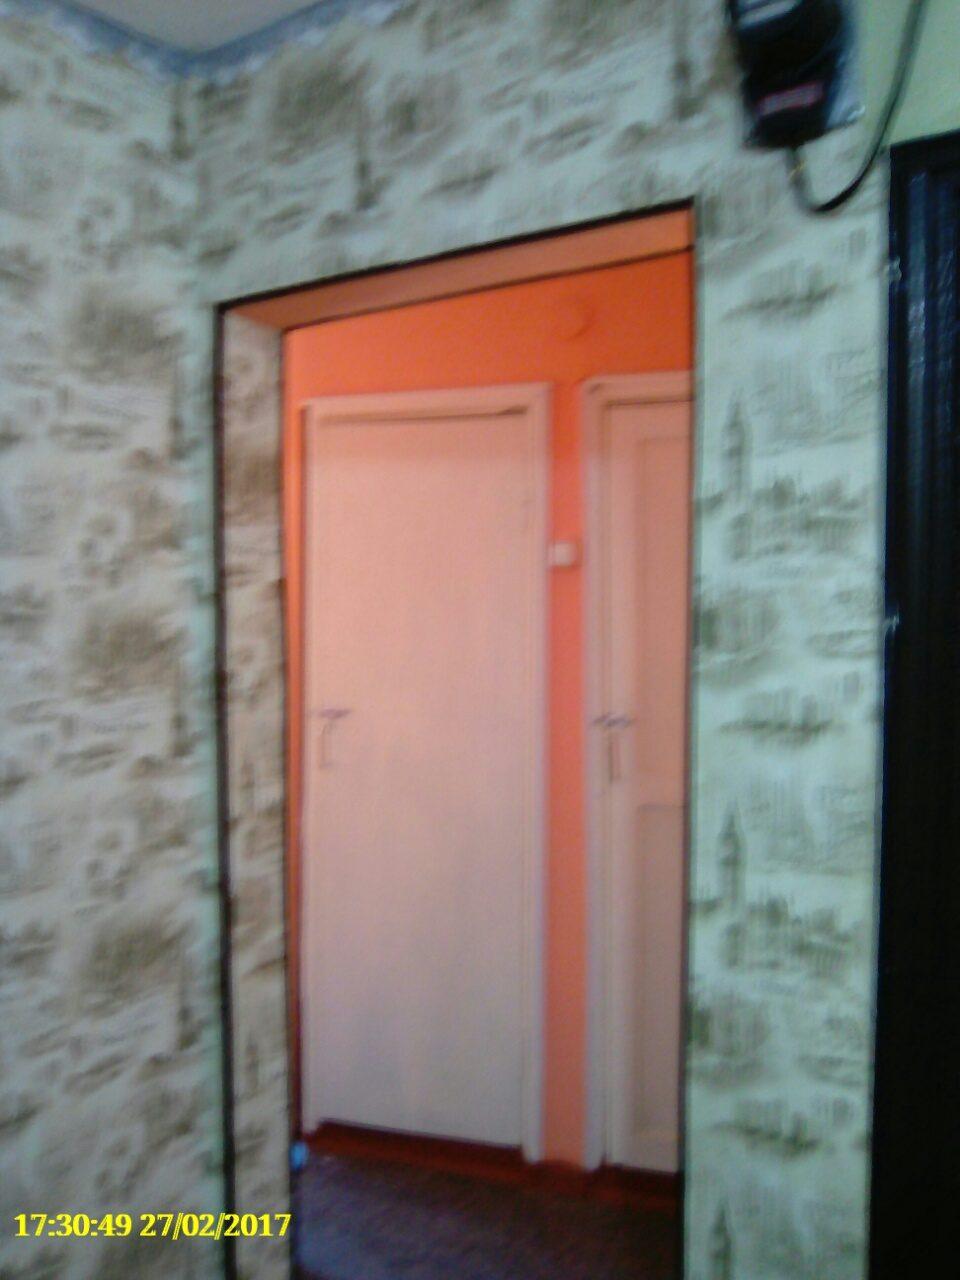 baa824413d36 Срочно продам , 3х комнатная, Ключевская, 5этаж, 550тр.89503853046.